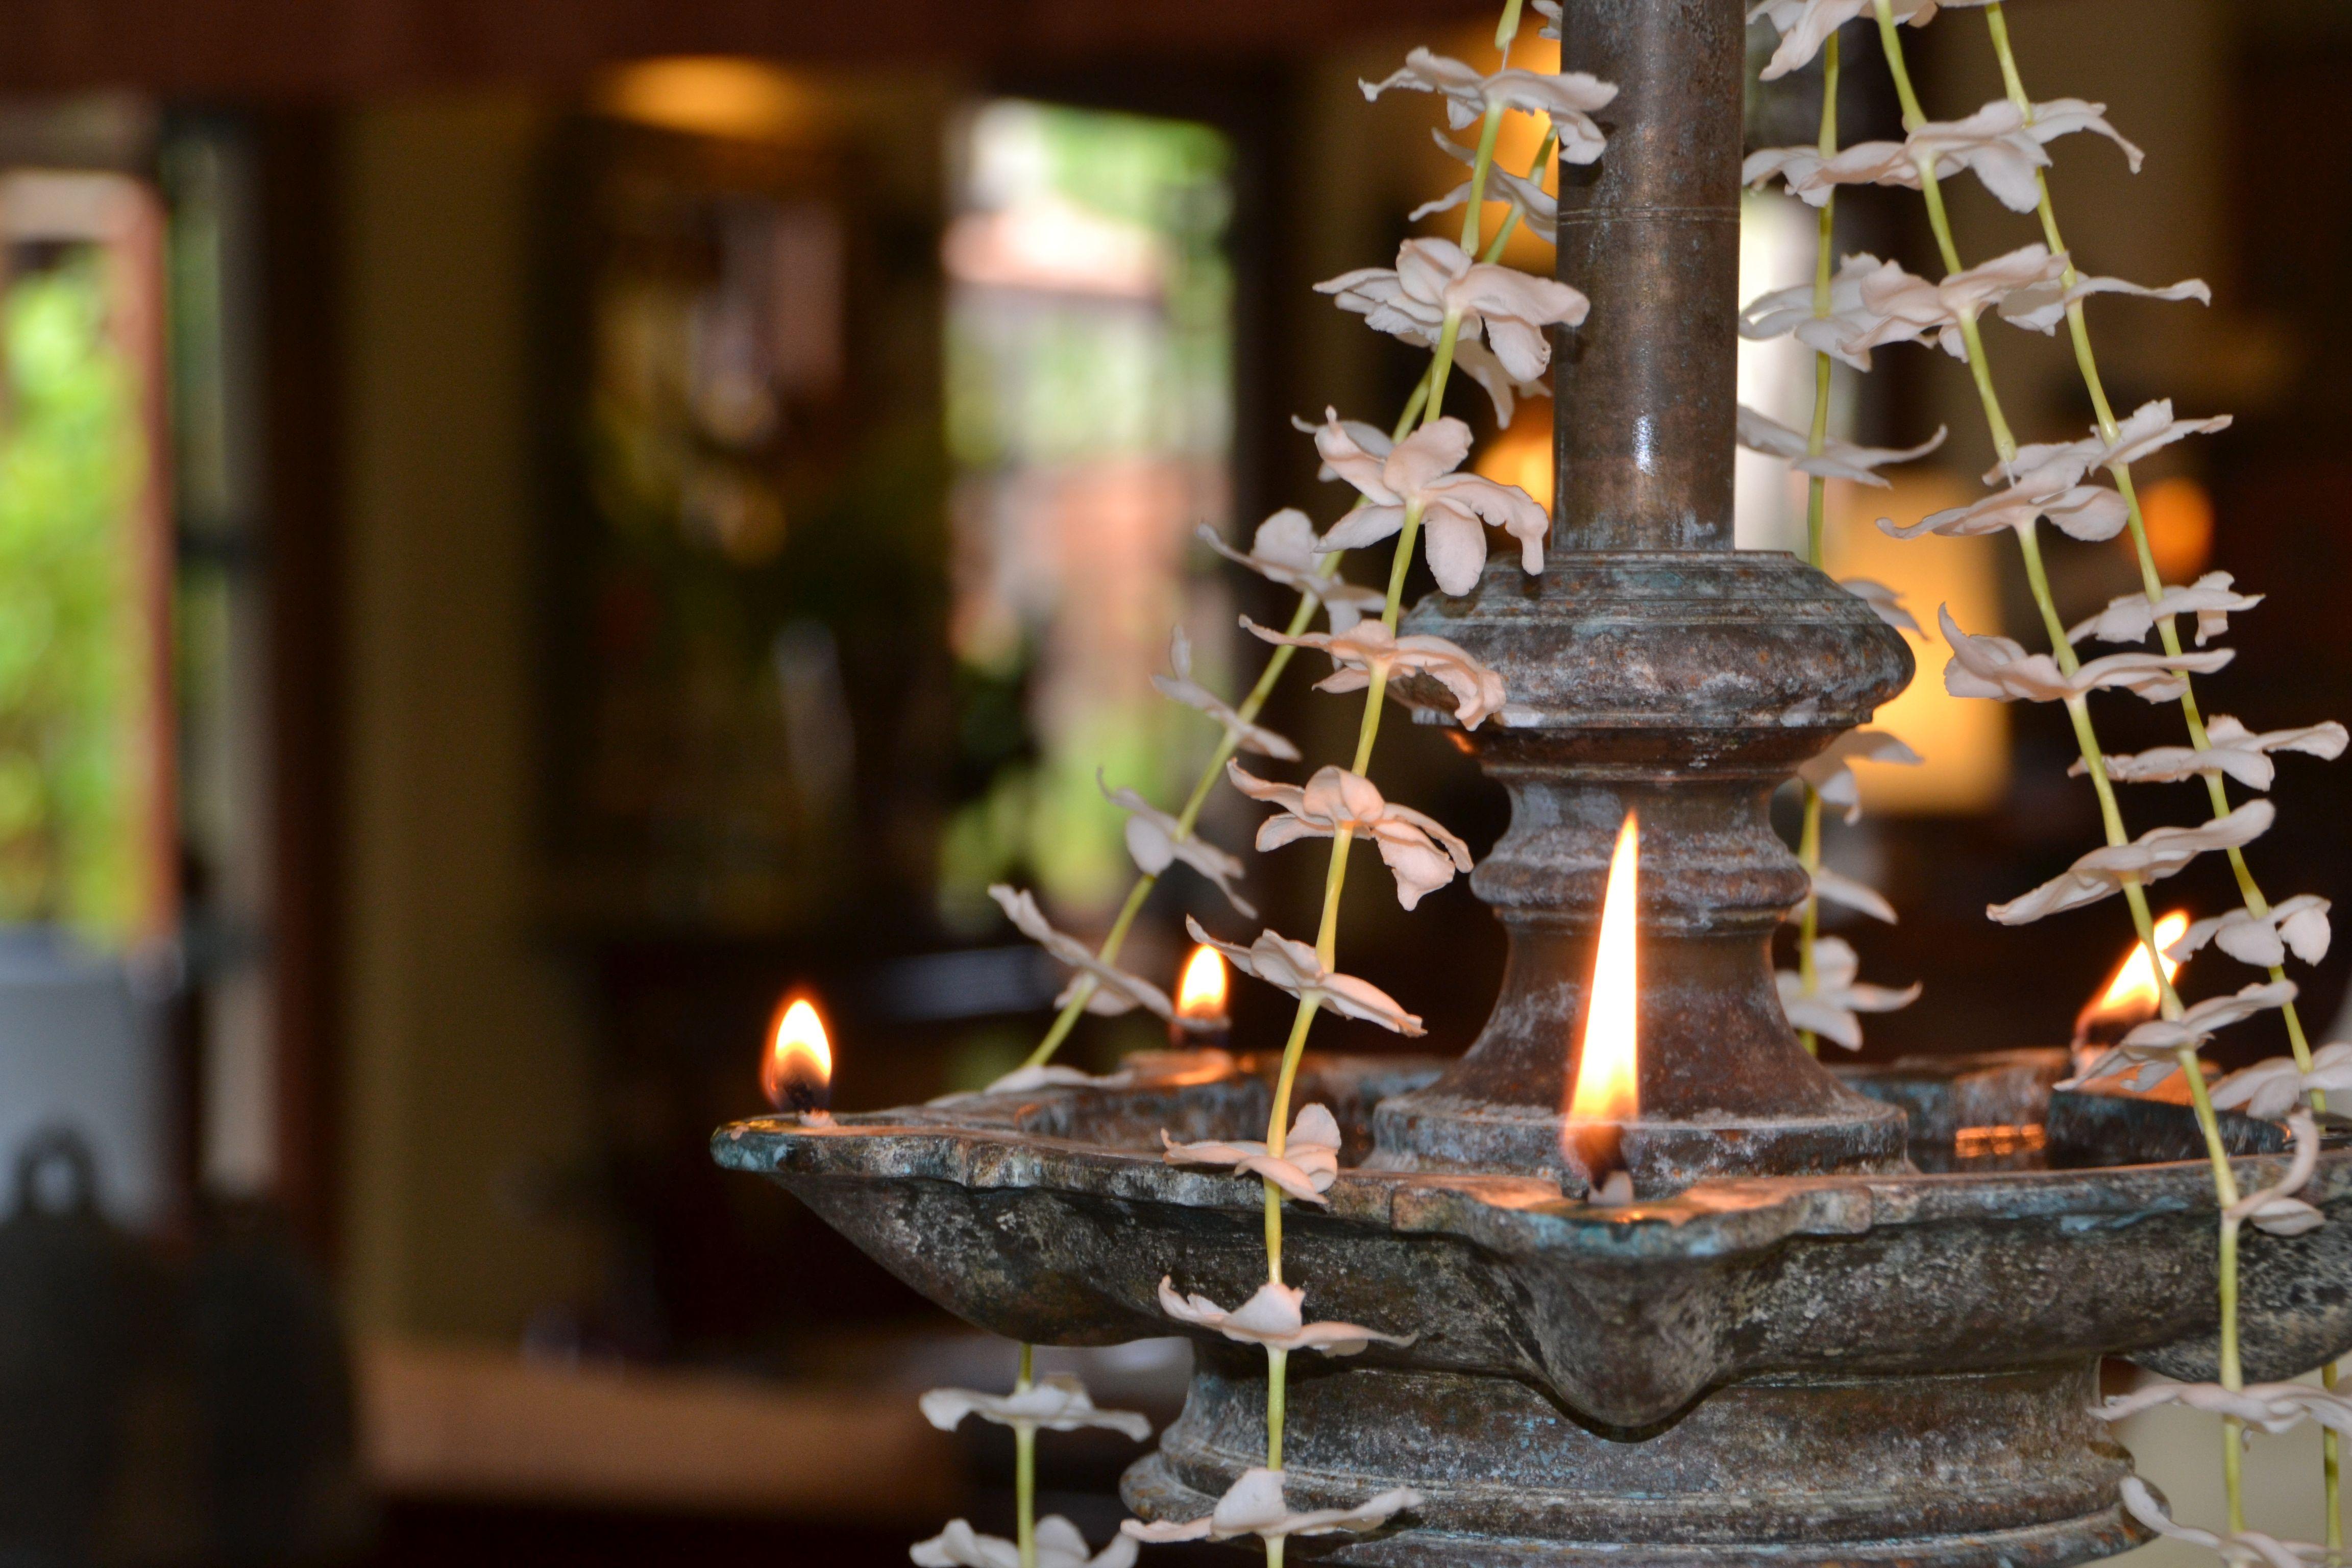 Traditional Sri Lankan Oil Lamp Lit During The Wedding Ceremony Luxuryresort Srilanka Tropicalwedd Oil Lamps Flower Background Wallpaper Flower Decorations